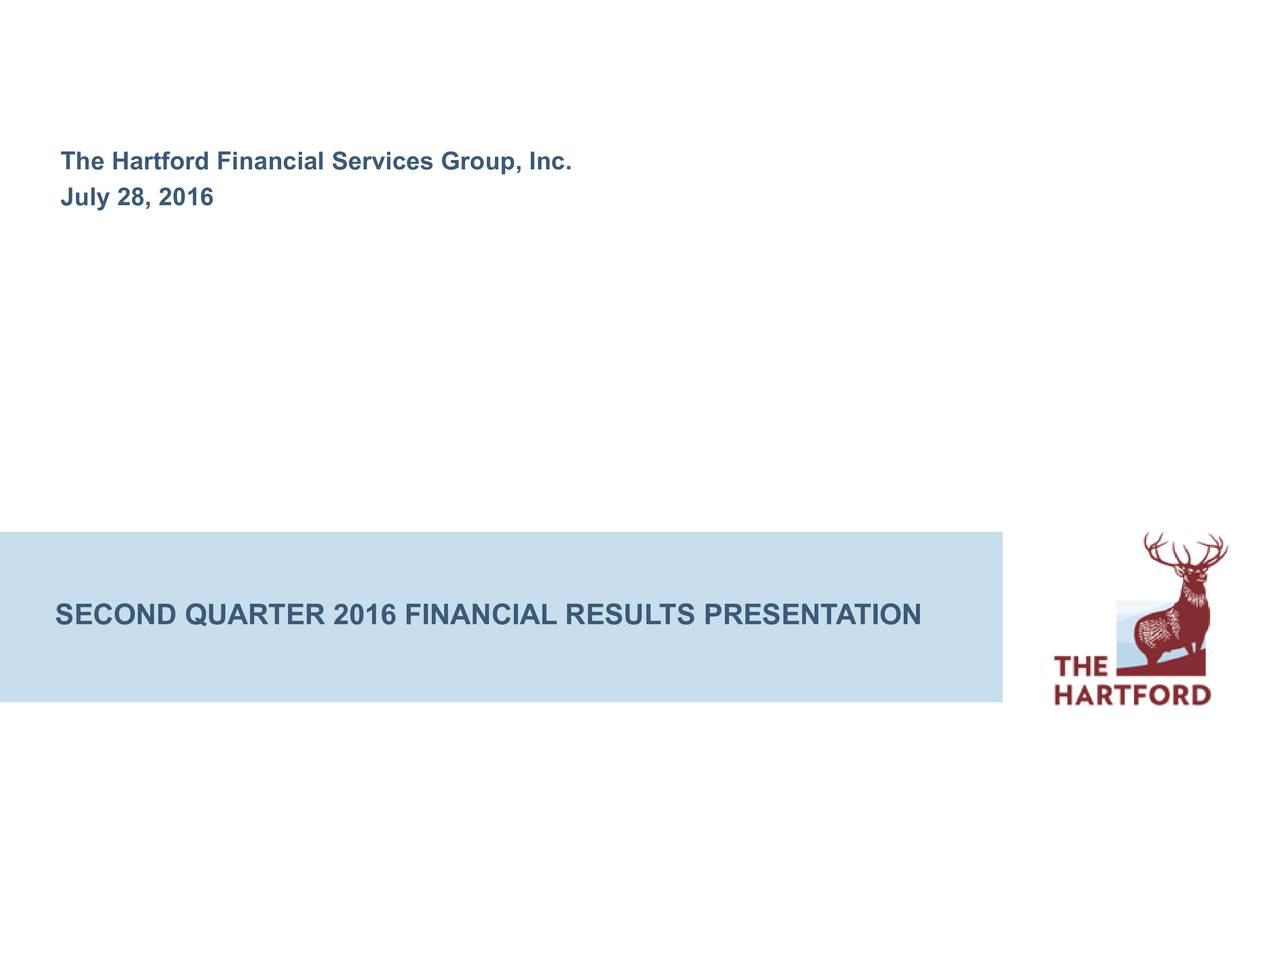 July28, 2016 SECOND QUARTER 2016 FINANCIAL RESULTS PRESENTATION